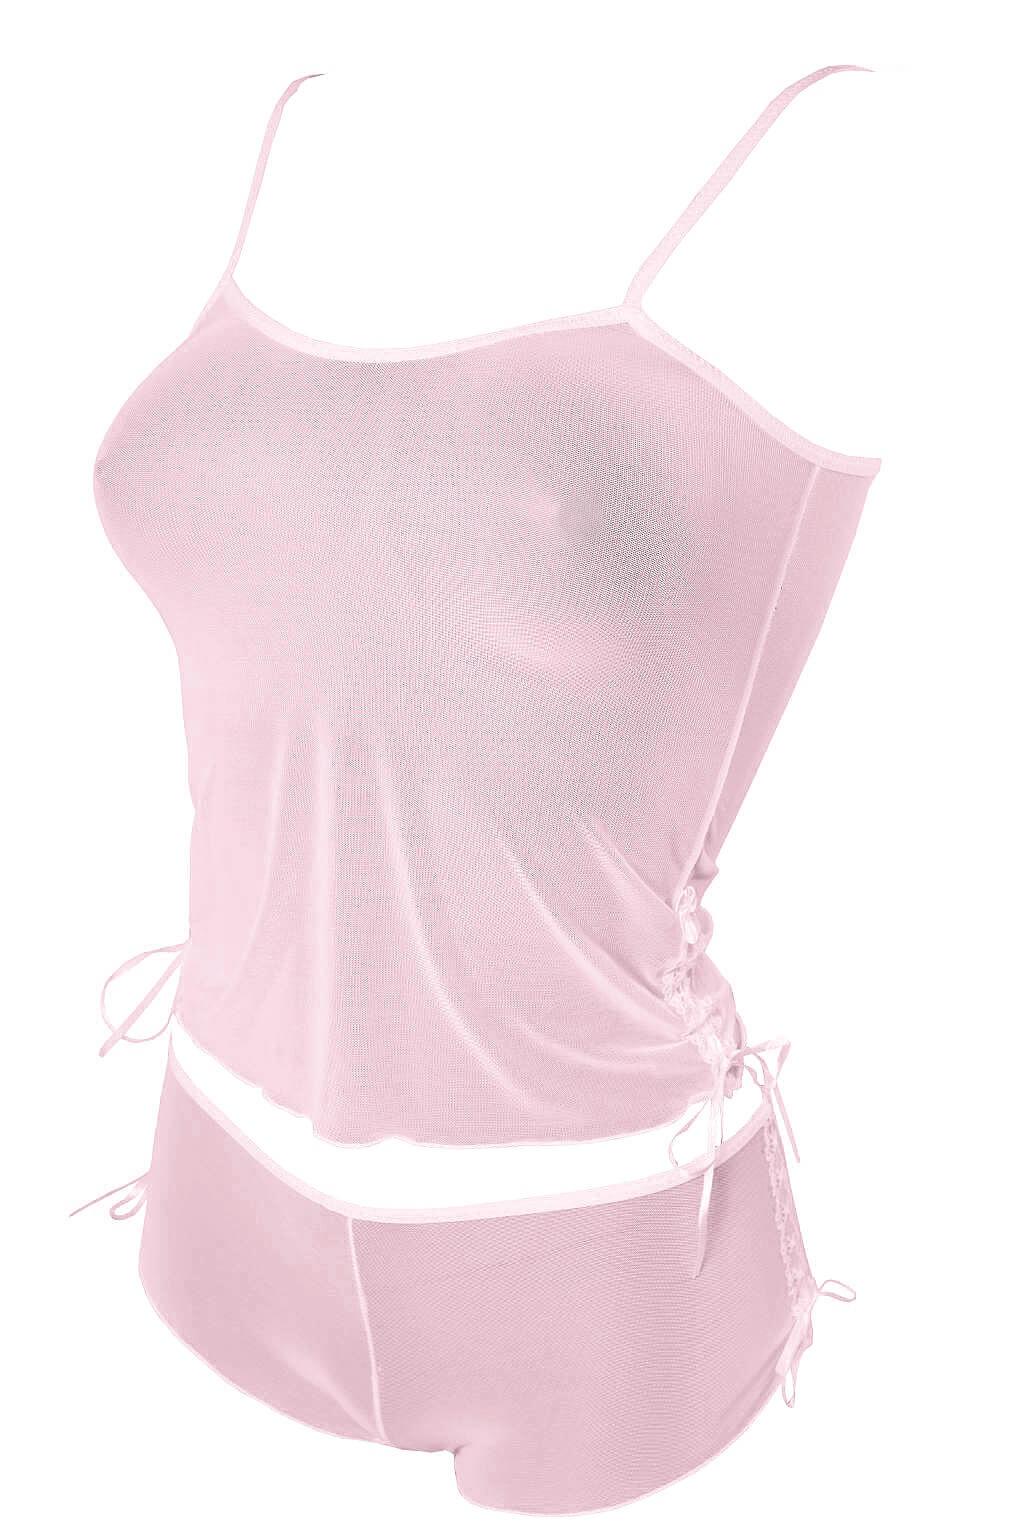 Selma komplet podprsenka + kalhotky M růžová